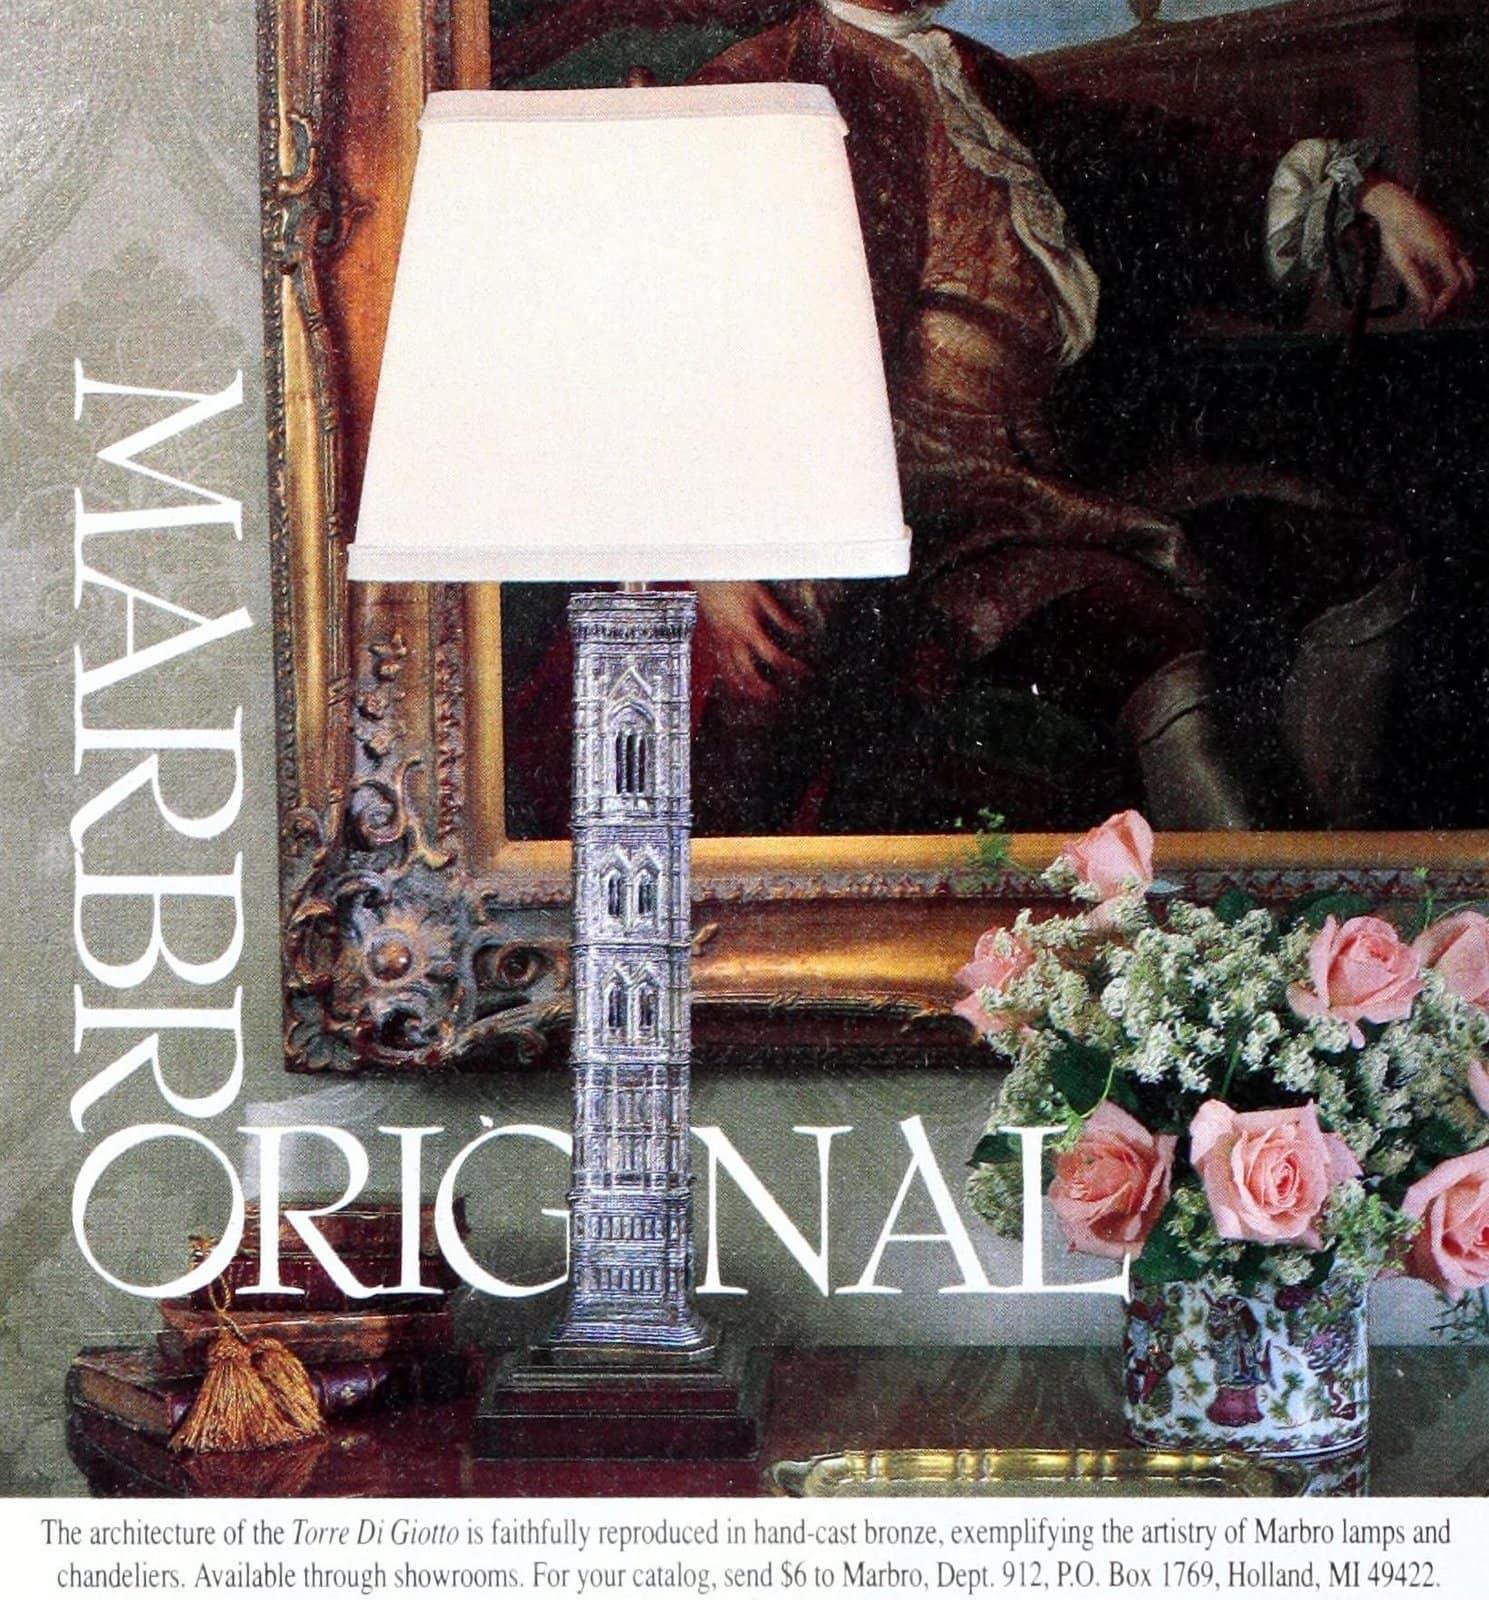 Vintage Marbro Original hand-cast bronze table lamp - Torre di Giotto design (1990)